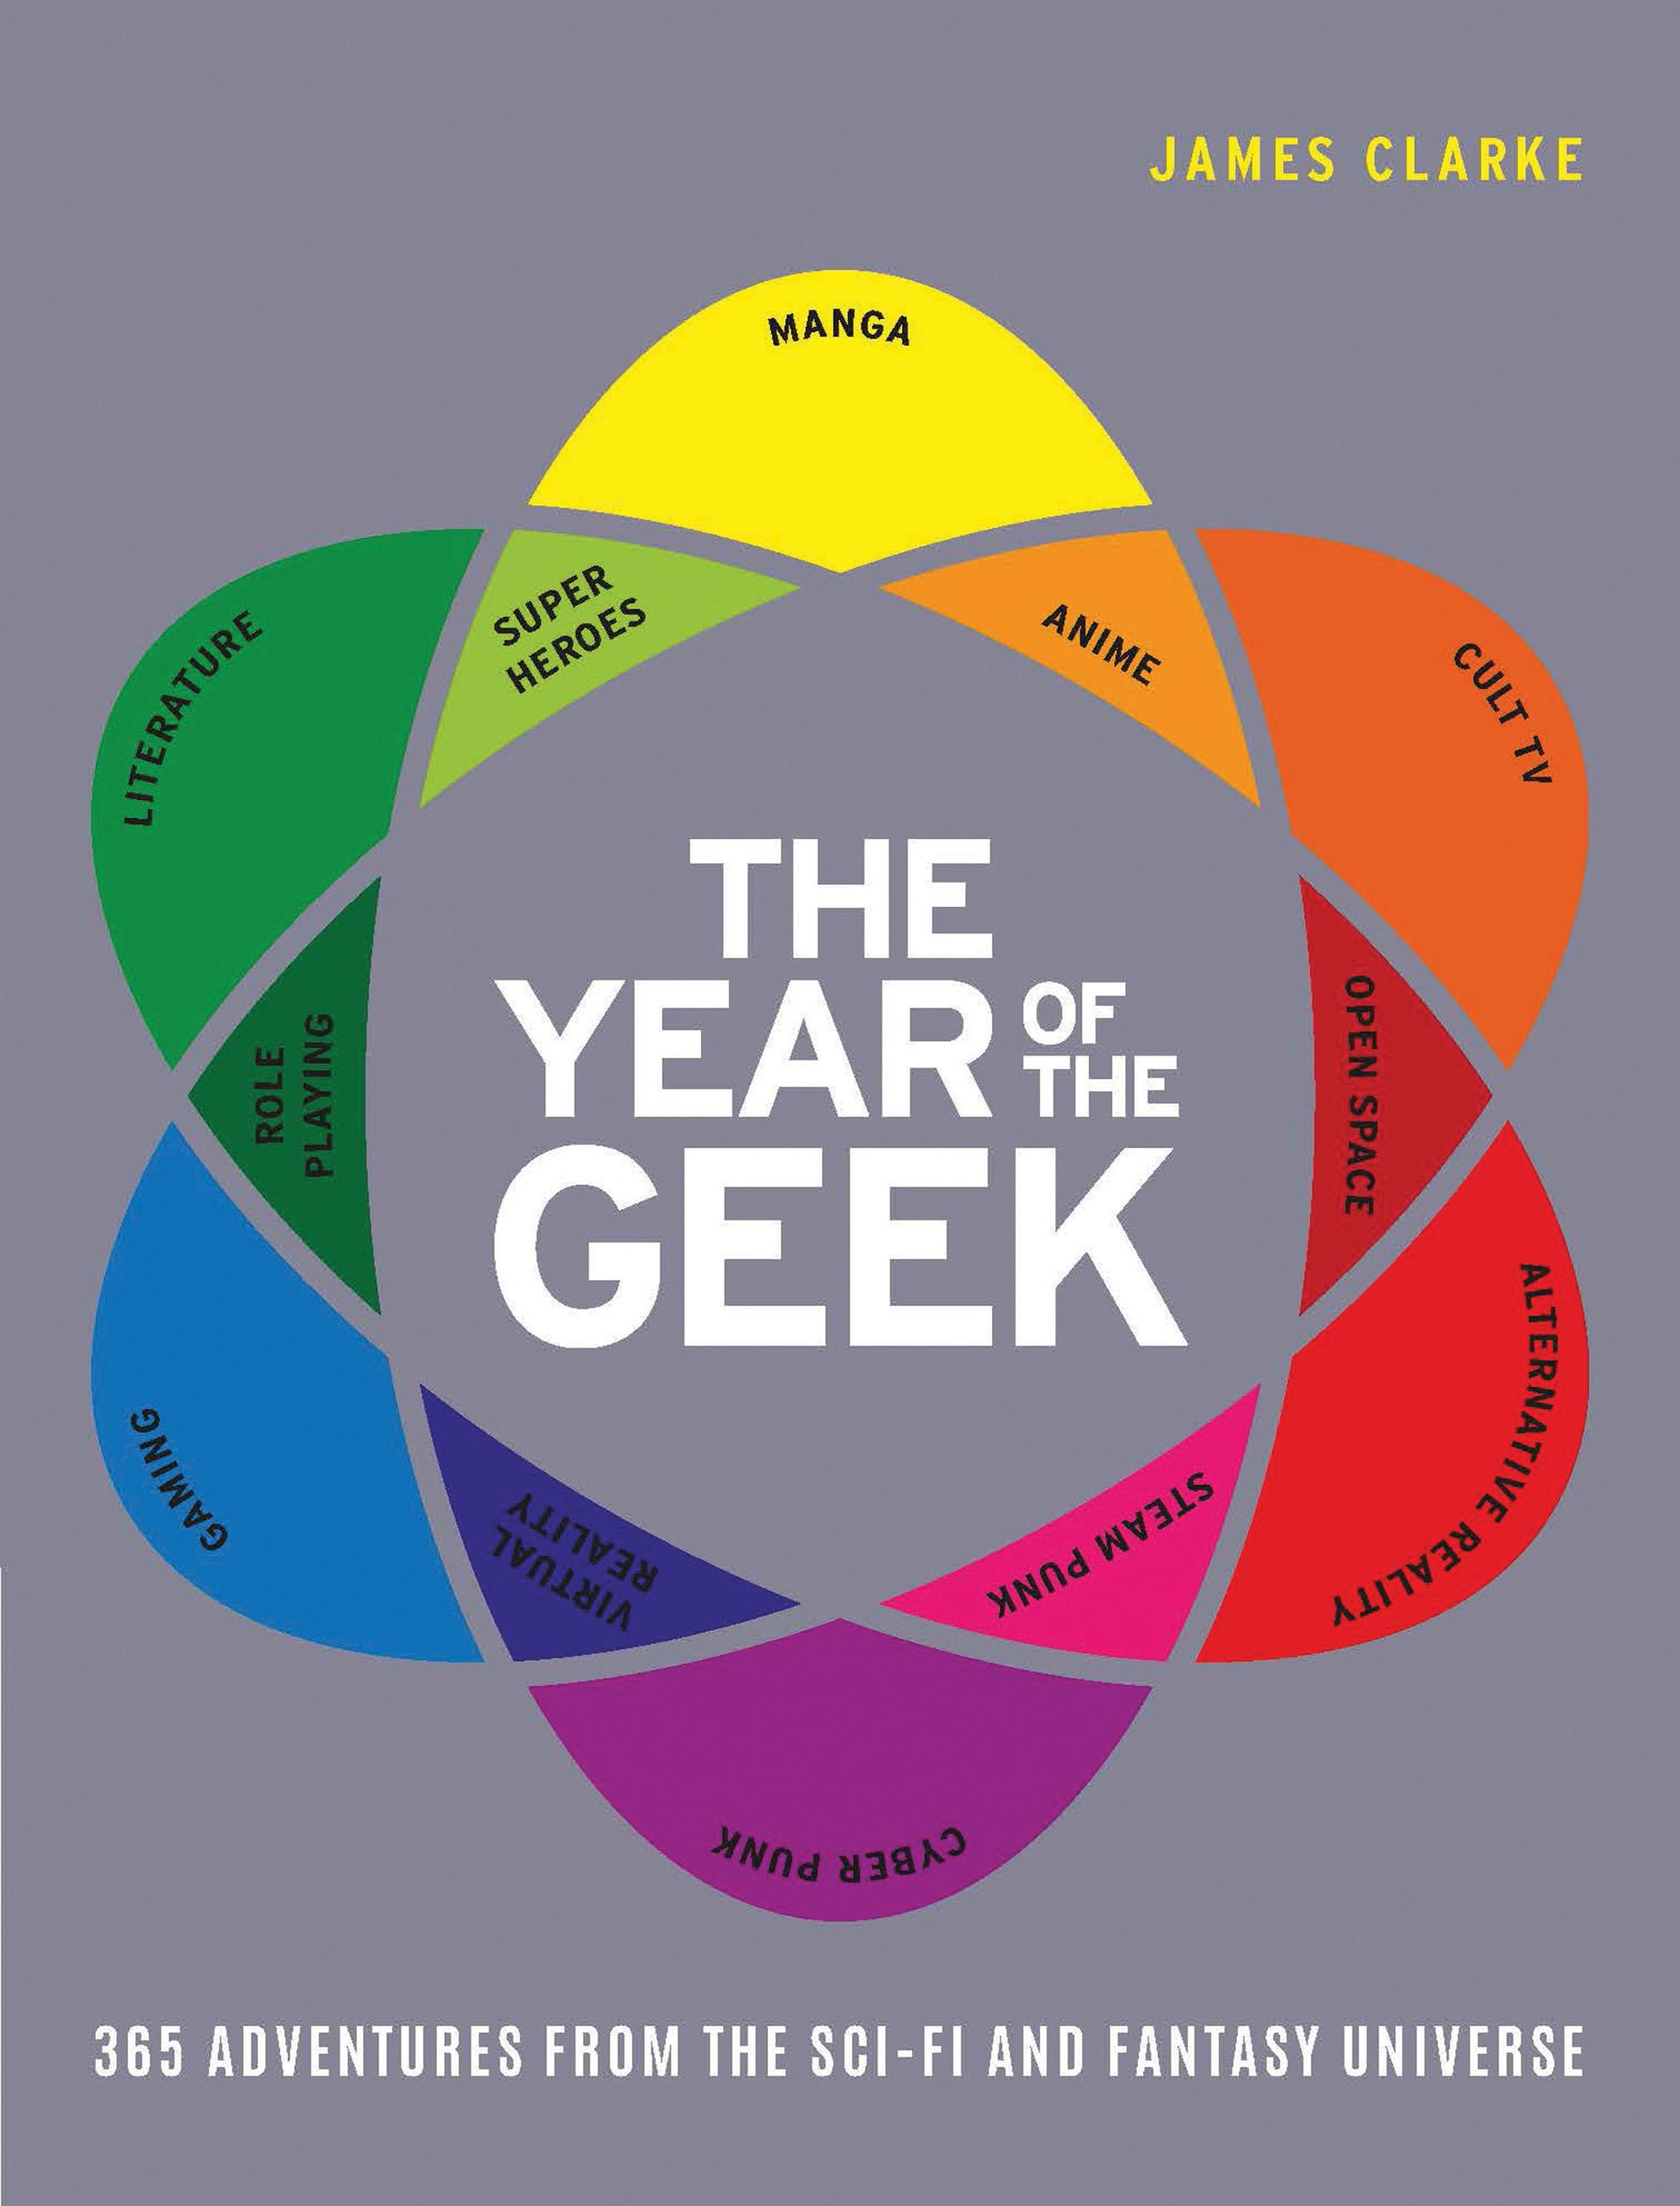 The Year Of The Geek James Clarke 9781781316924 Murdoch Books